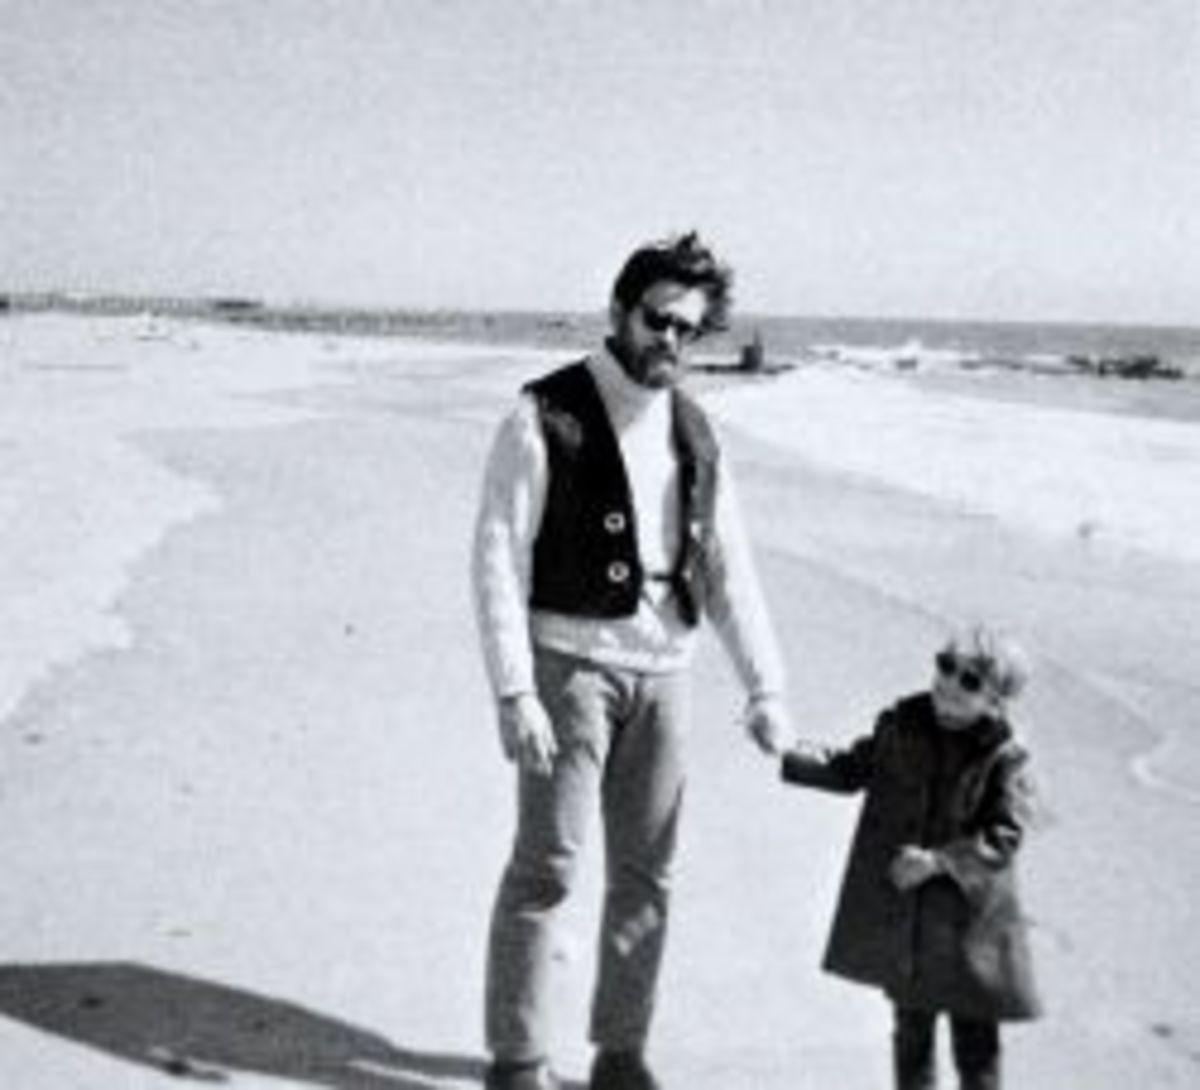 My Dad & I at Coney Island, circa 1969